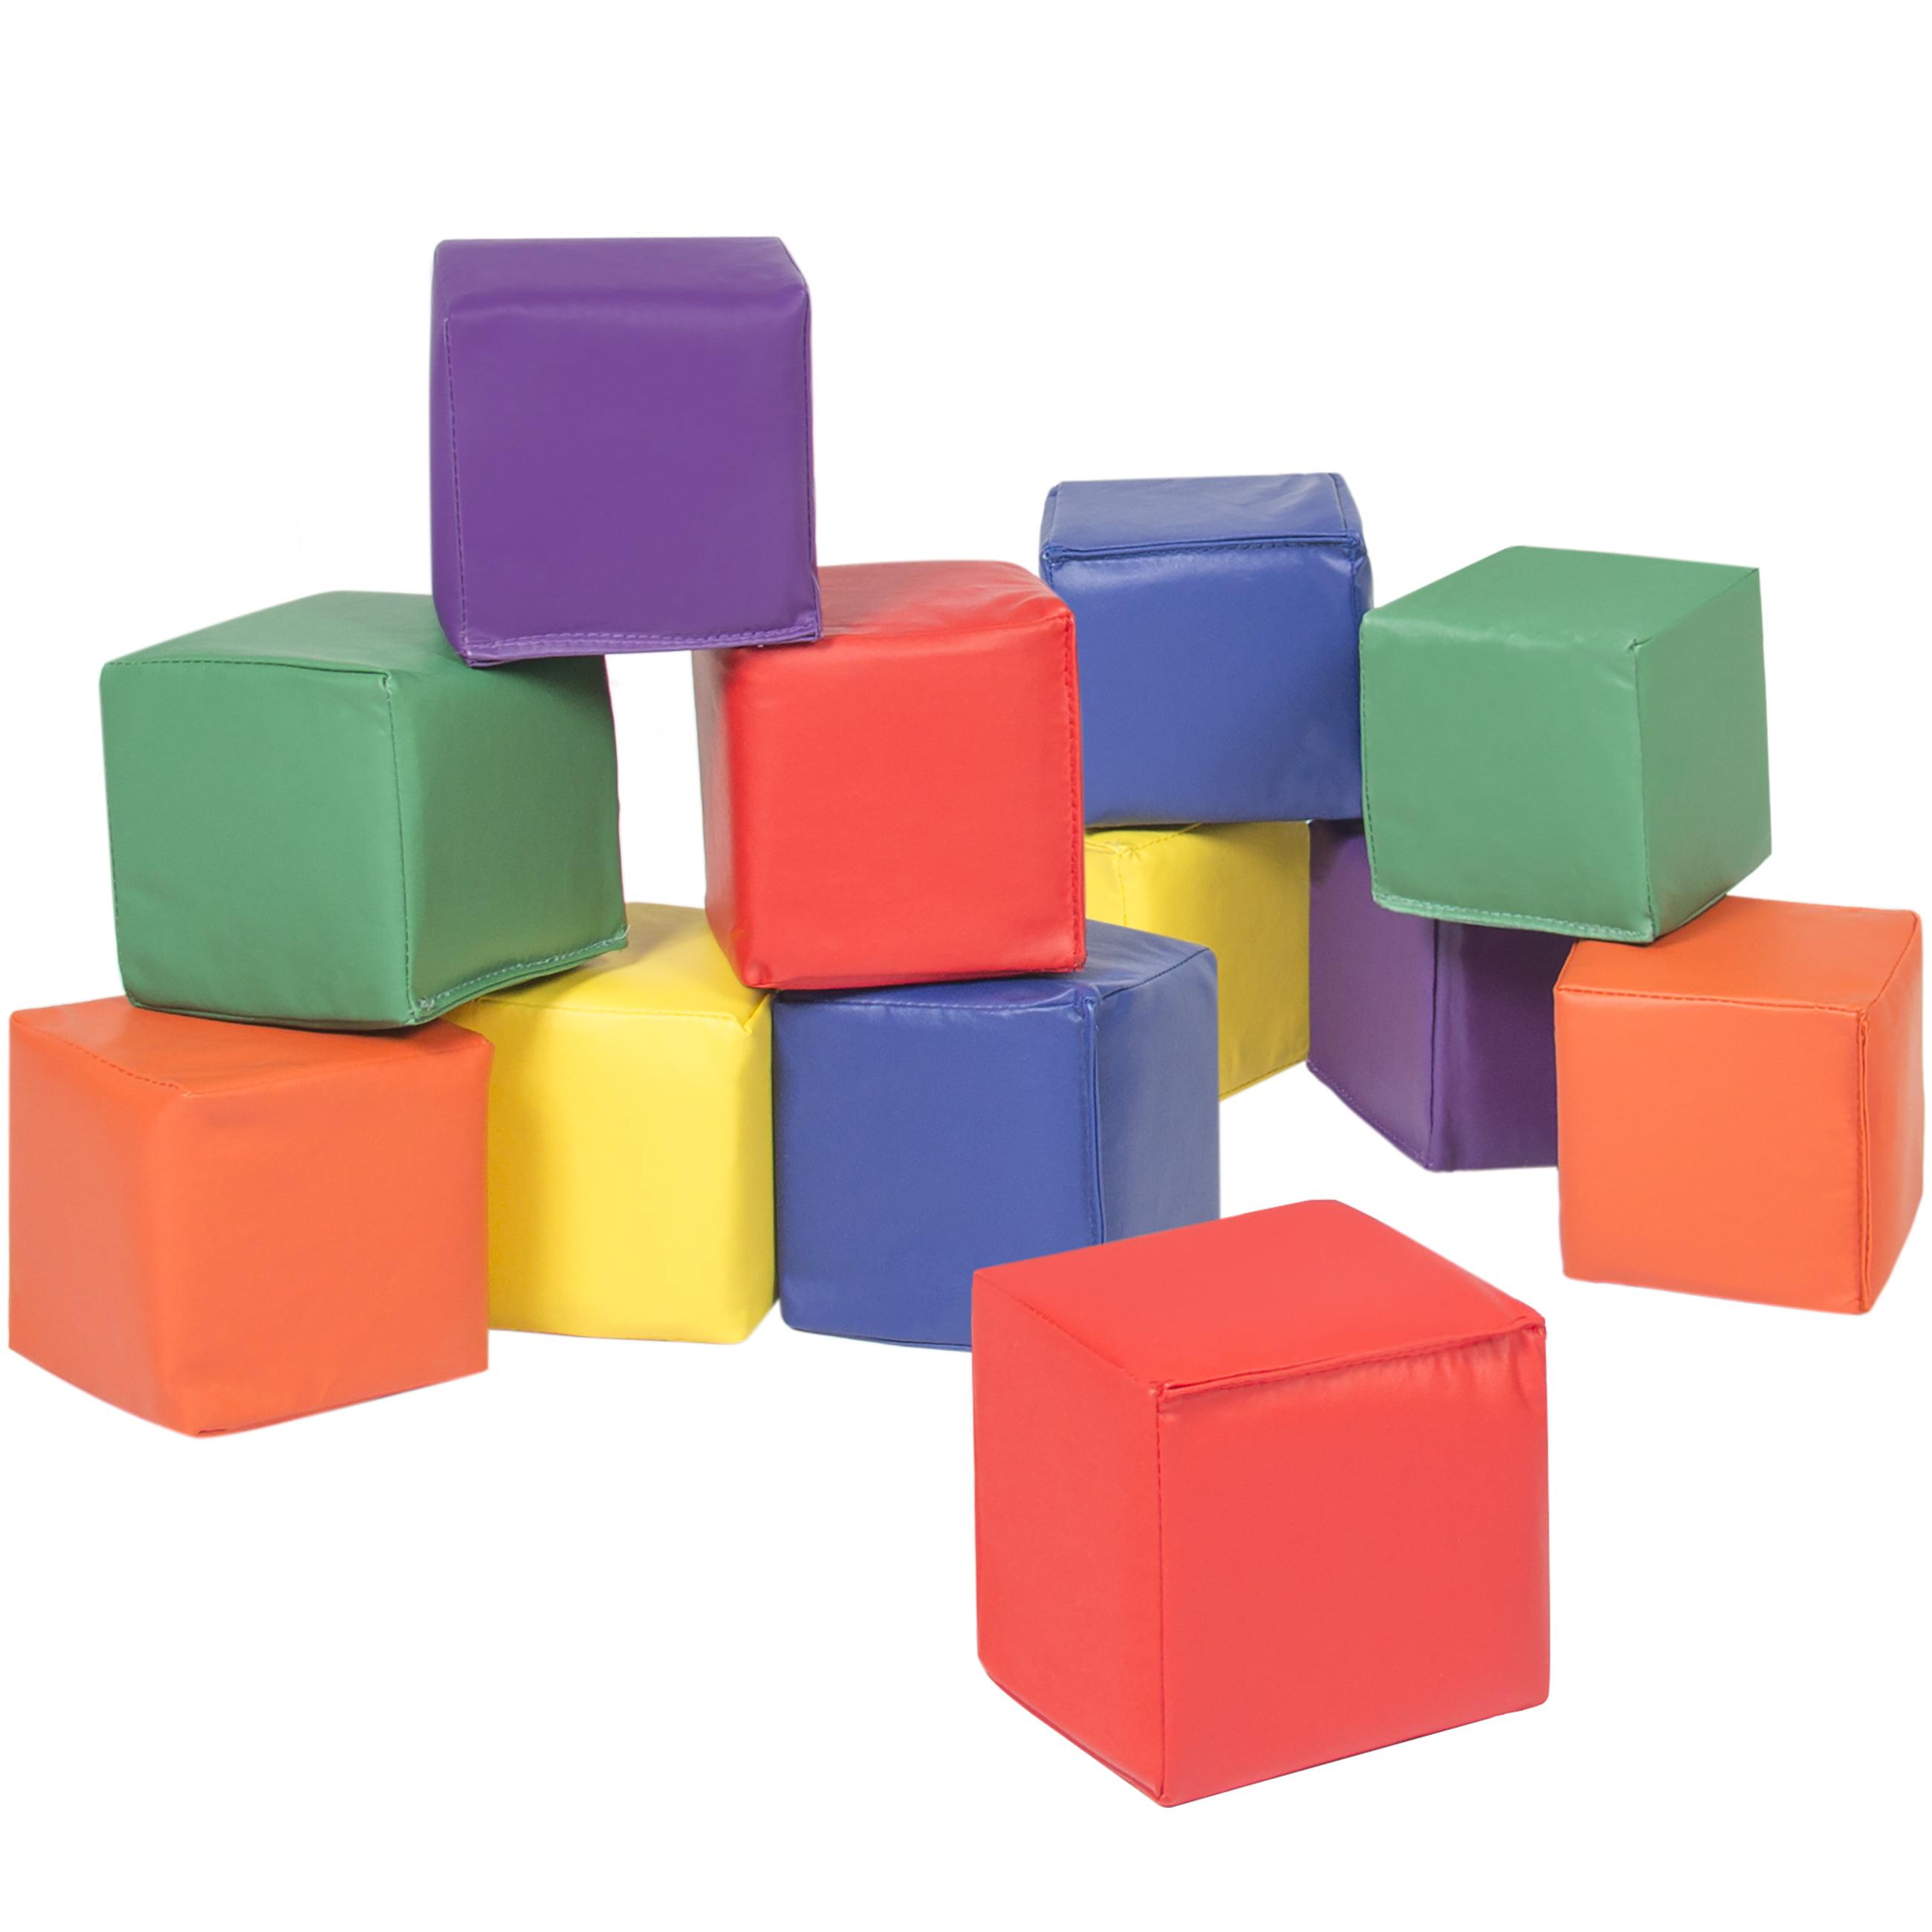 Best Choice Products 12 Piece Soft Big Foam Blocks Playset for Sensory, Motor Developmental Skills - Multicolor